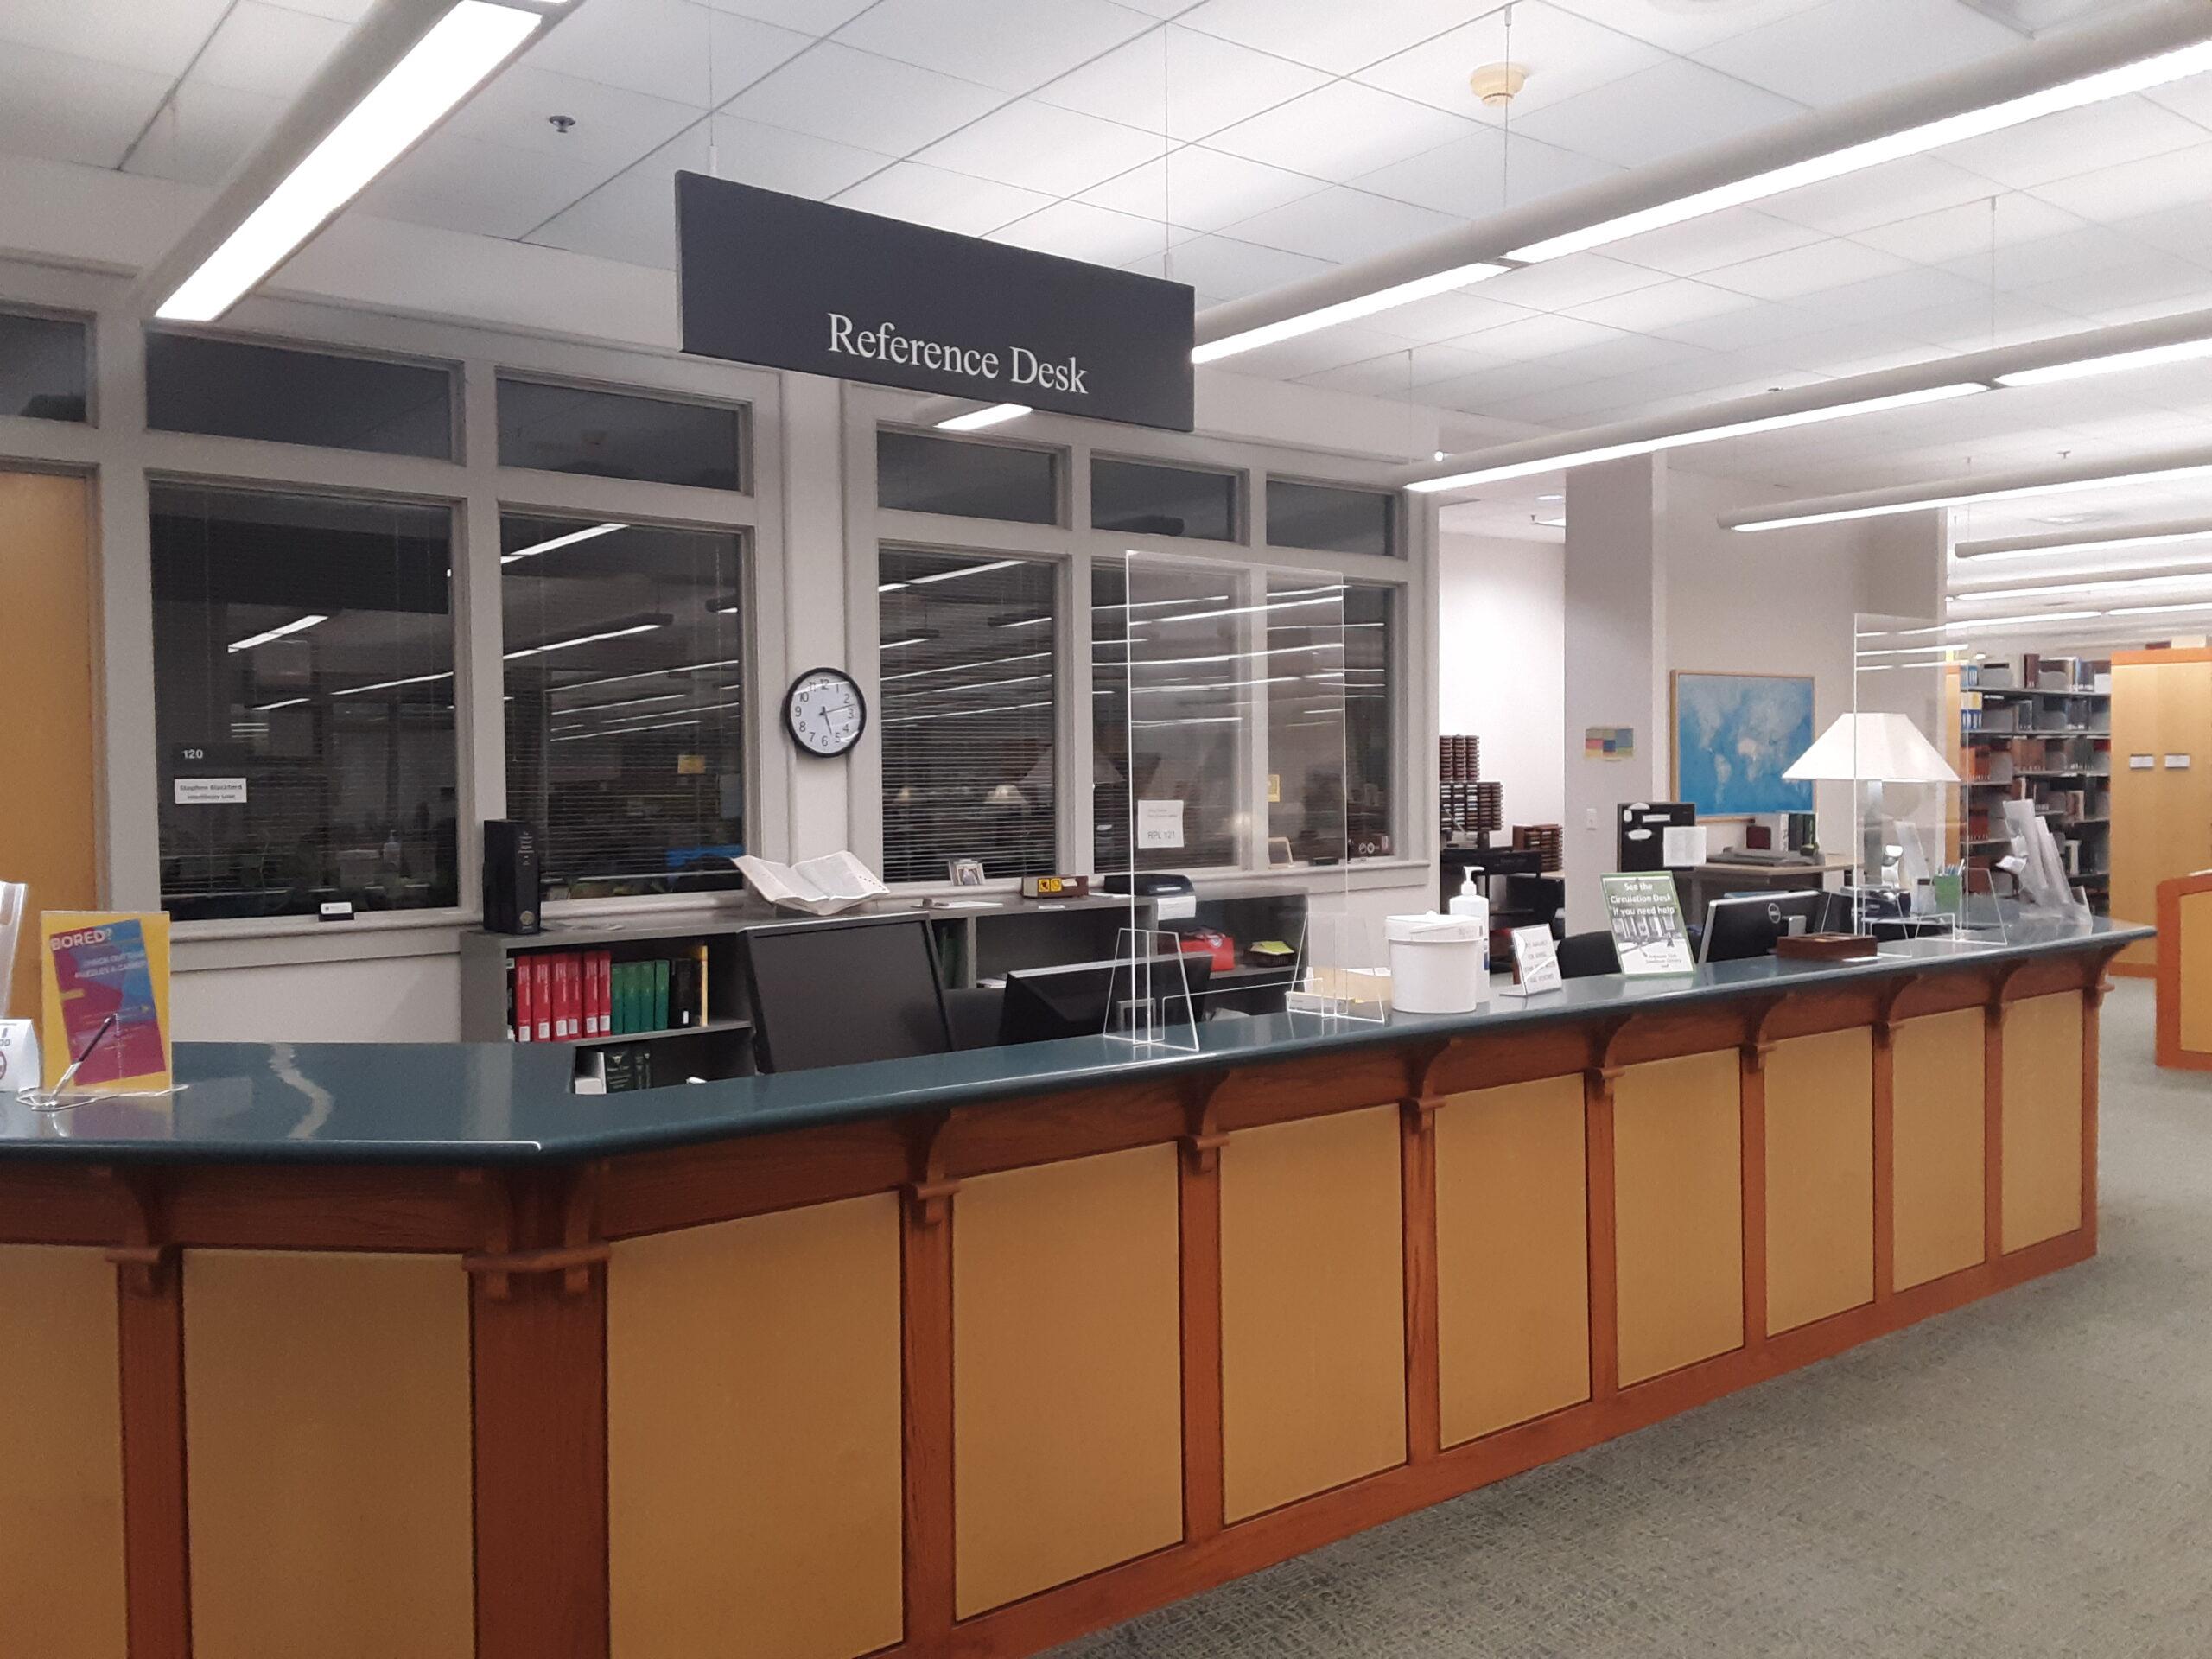 Learning Center Reference Desk